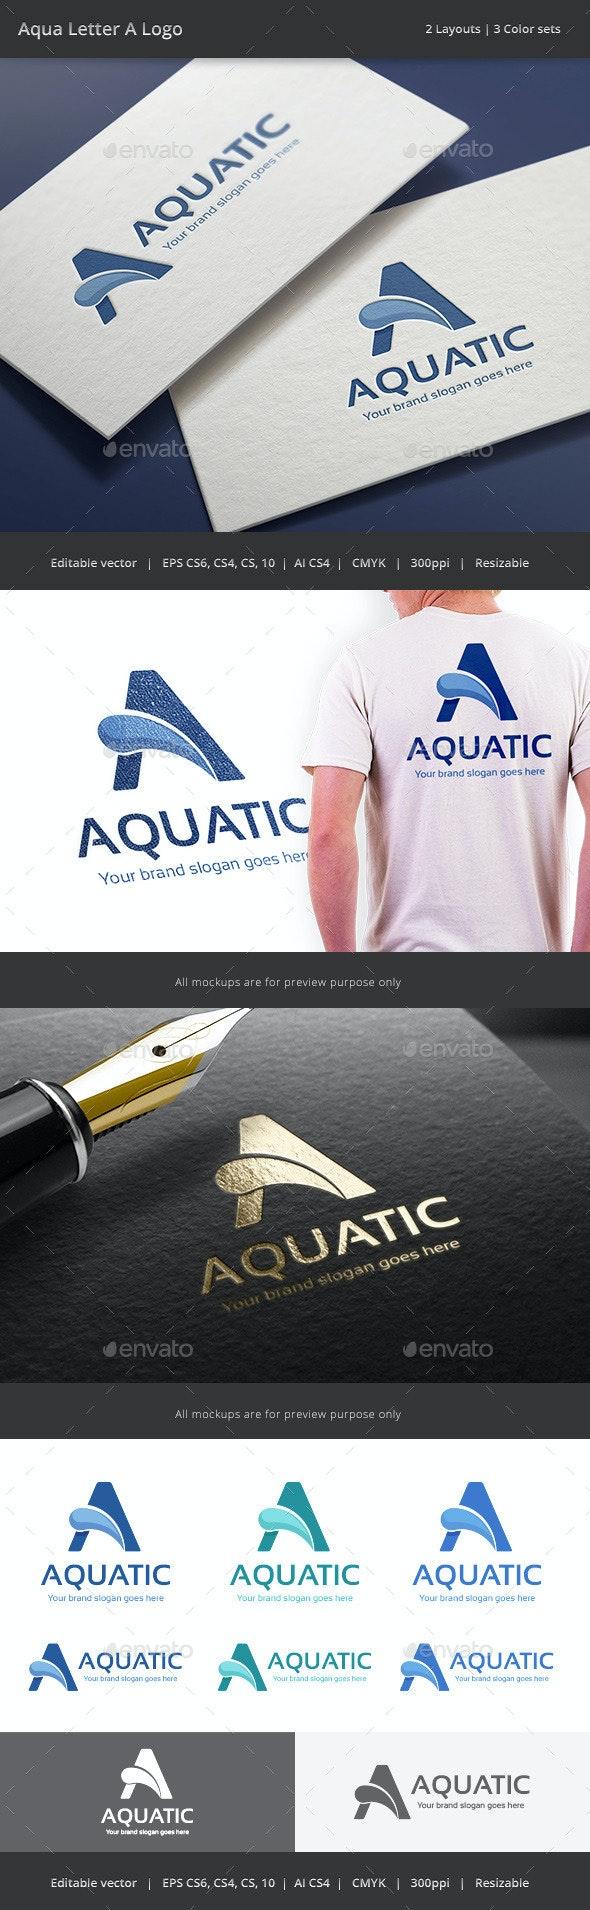 Aqua Letter A Logo - Letters Logo Templates